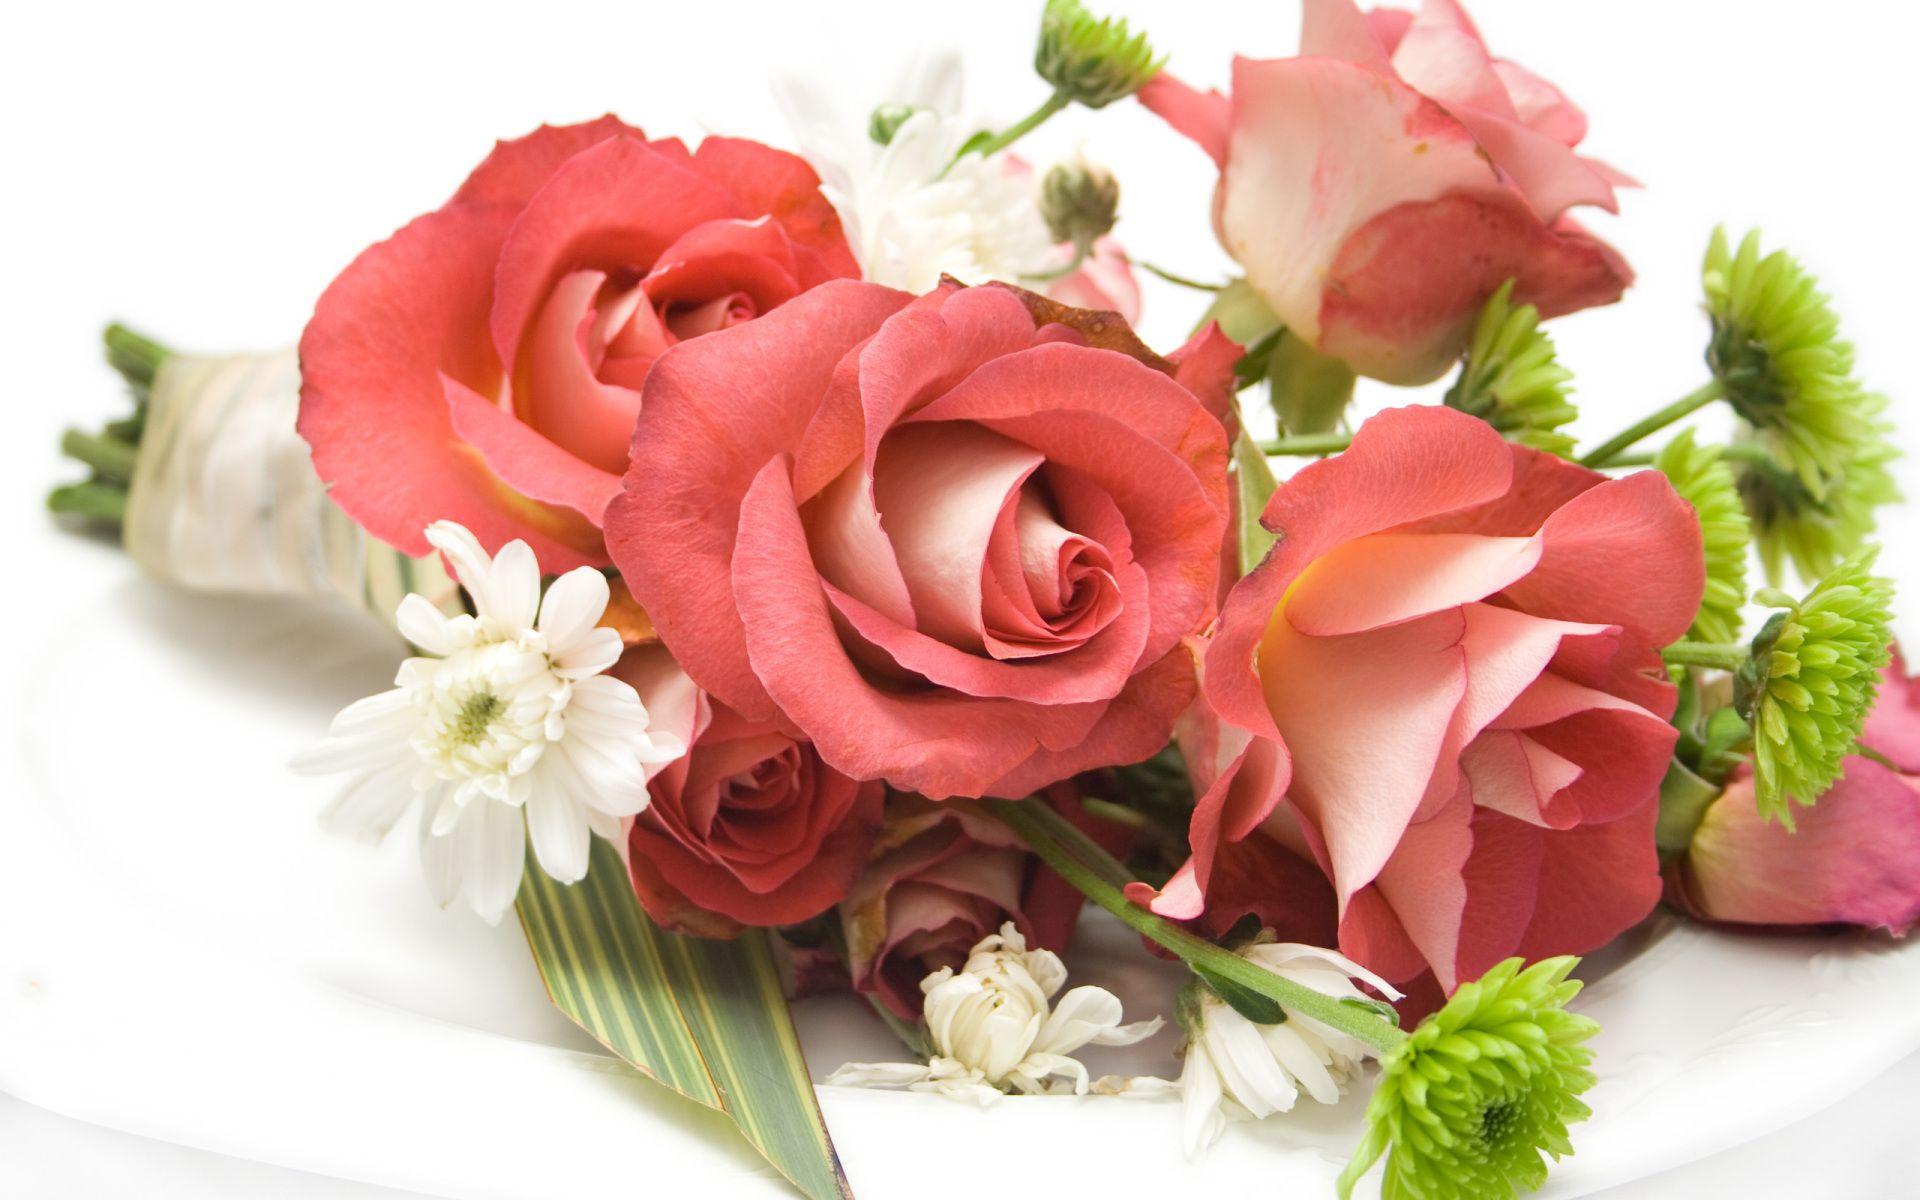 Bouquet of flowers 4389587 1680x1050px flowers pinterest send bouquet of flowers 4389587 1680x1050px izmirmasajfo